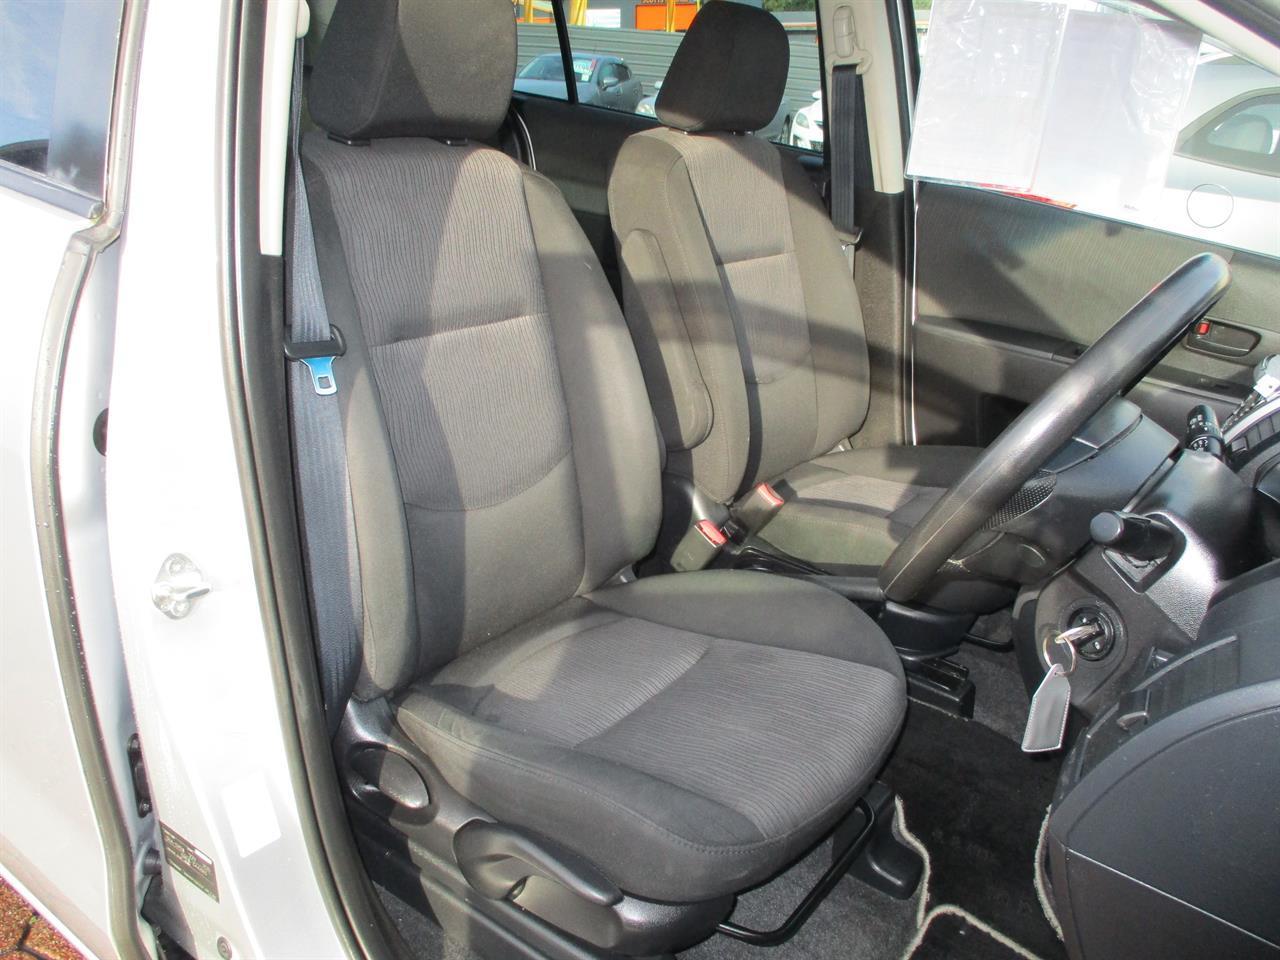 image-14, 2010 Mazda Premacy Seven Seater at Dunedin